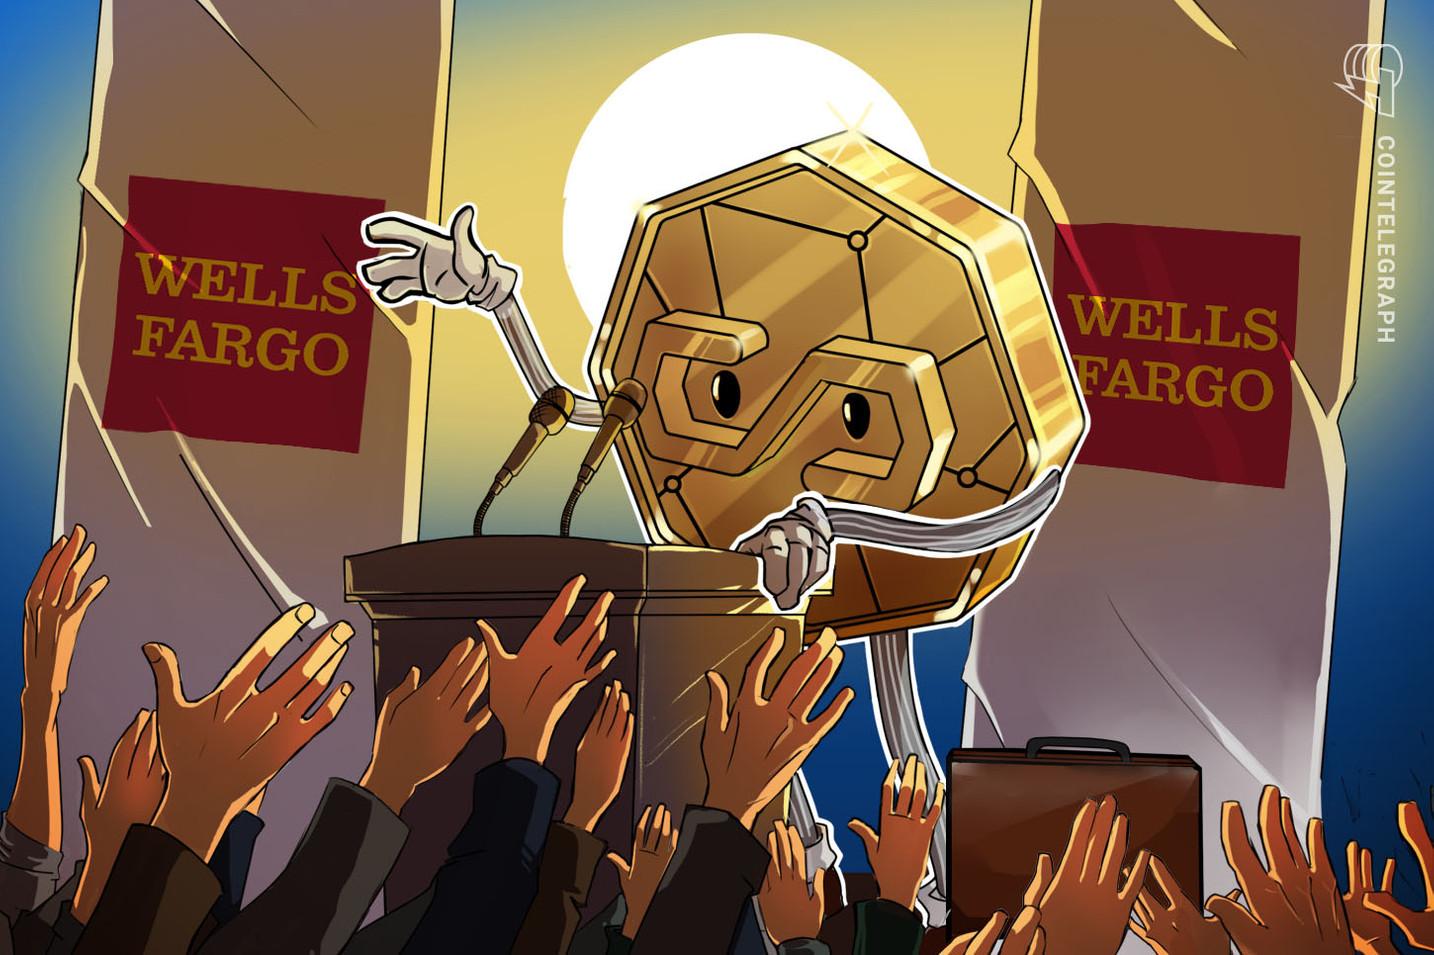 Wells Fargo Joins Elliptic's Series B Investment Round